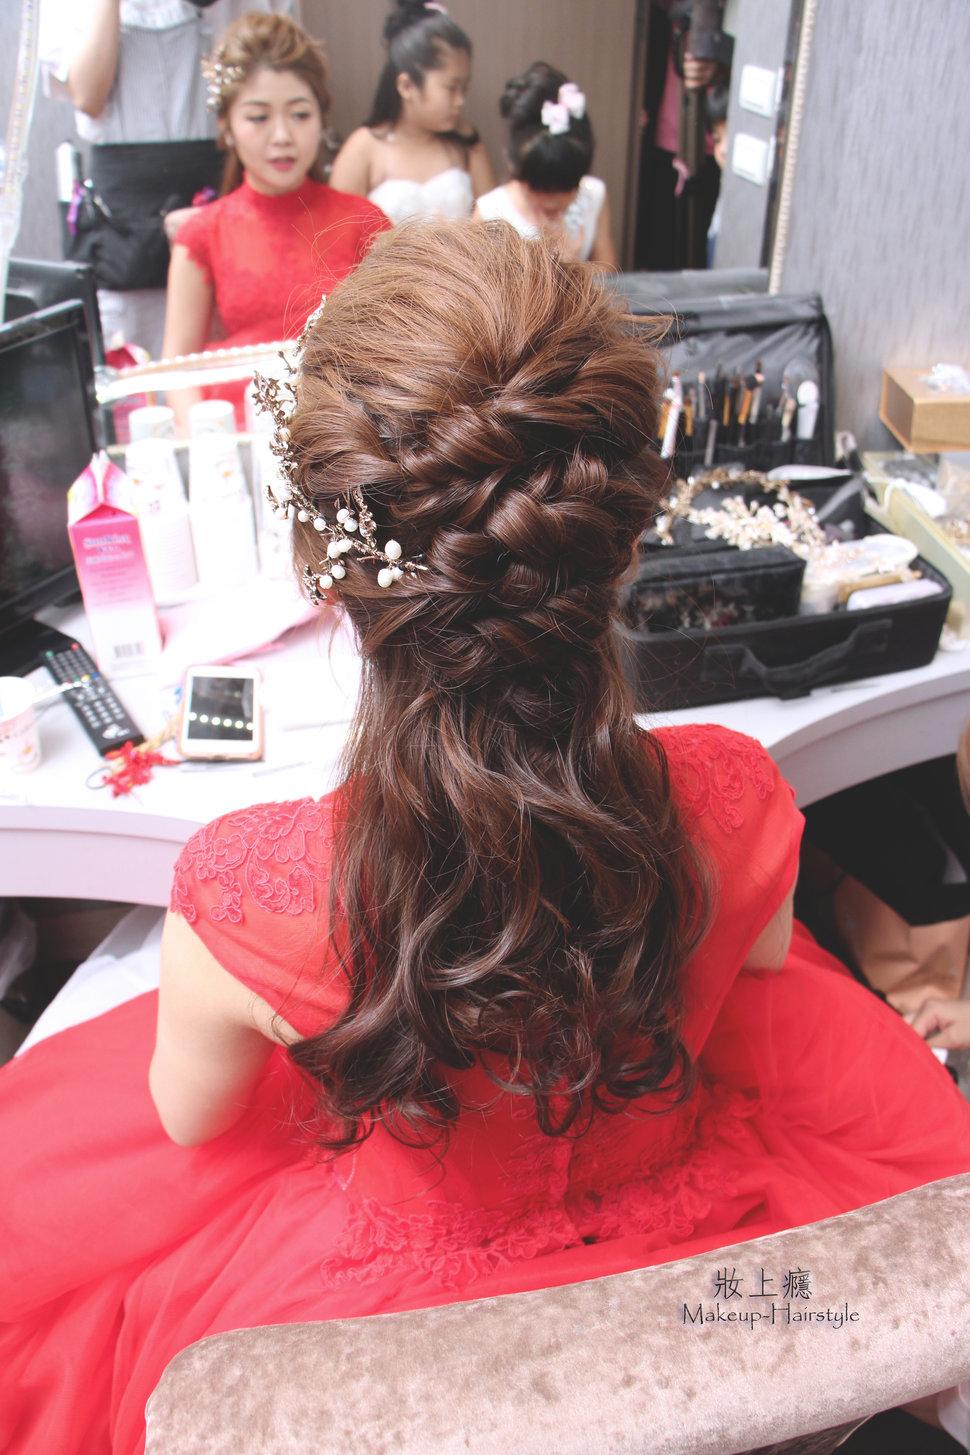 8 - Makeup-hairstyle 妝上癮 - 結婚吧一站式婚禮服務平台